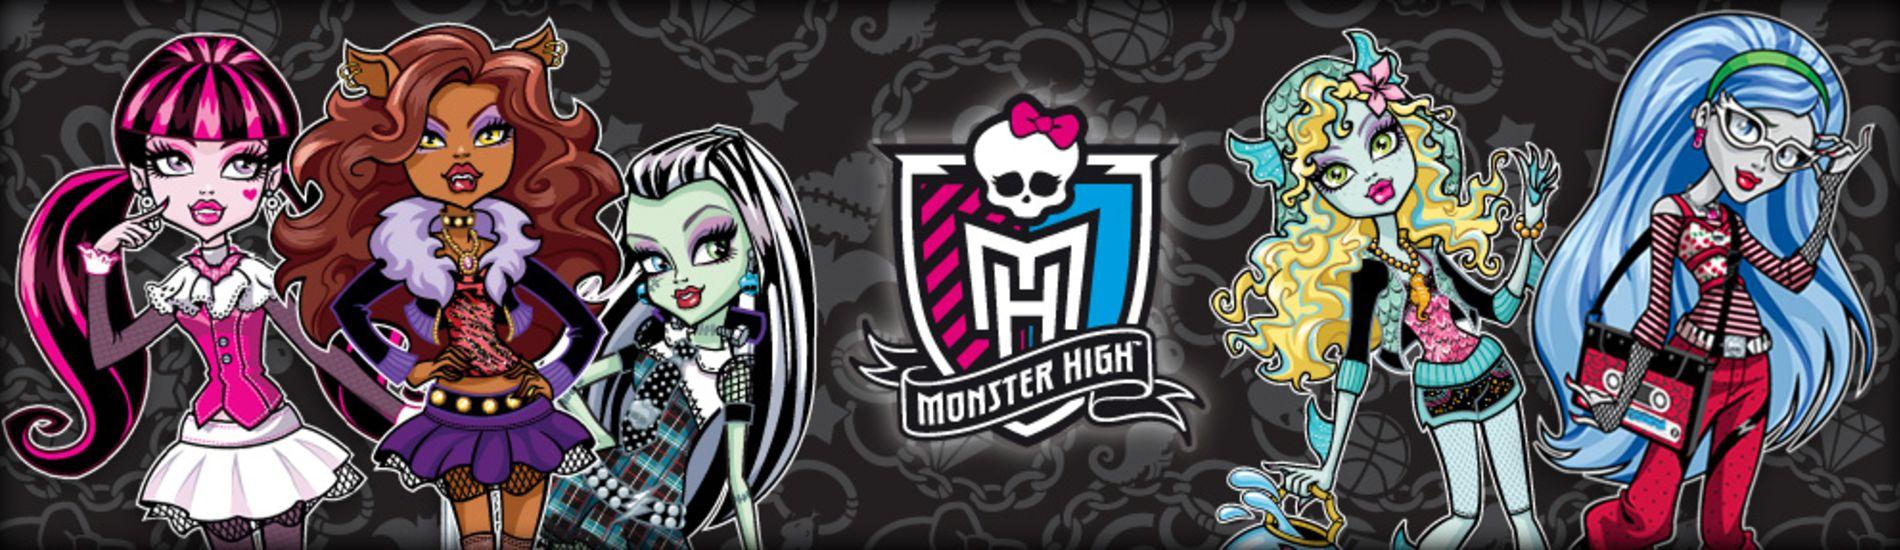 dessin animé monster high